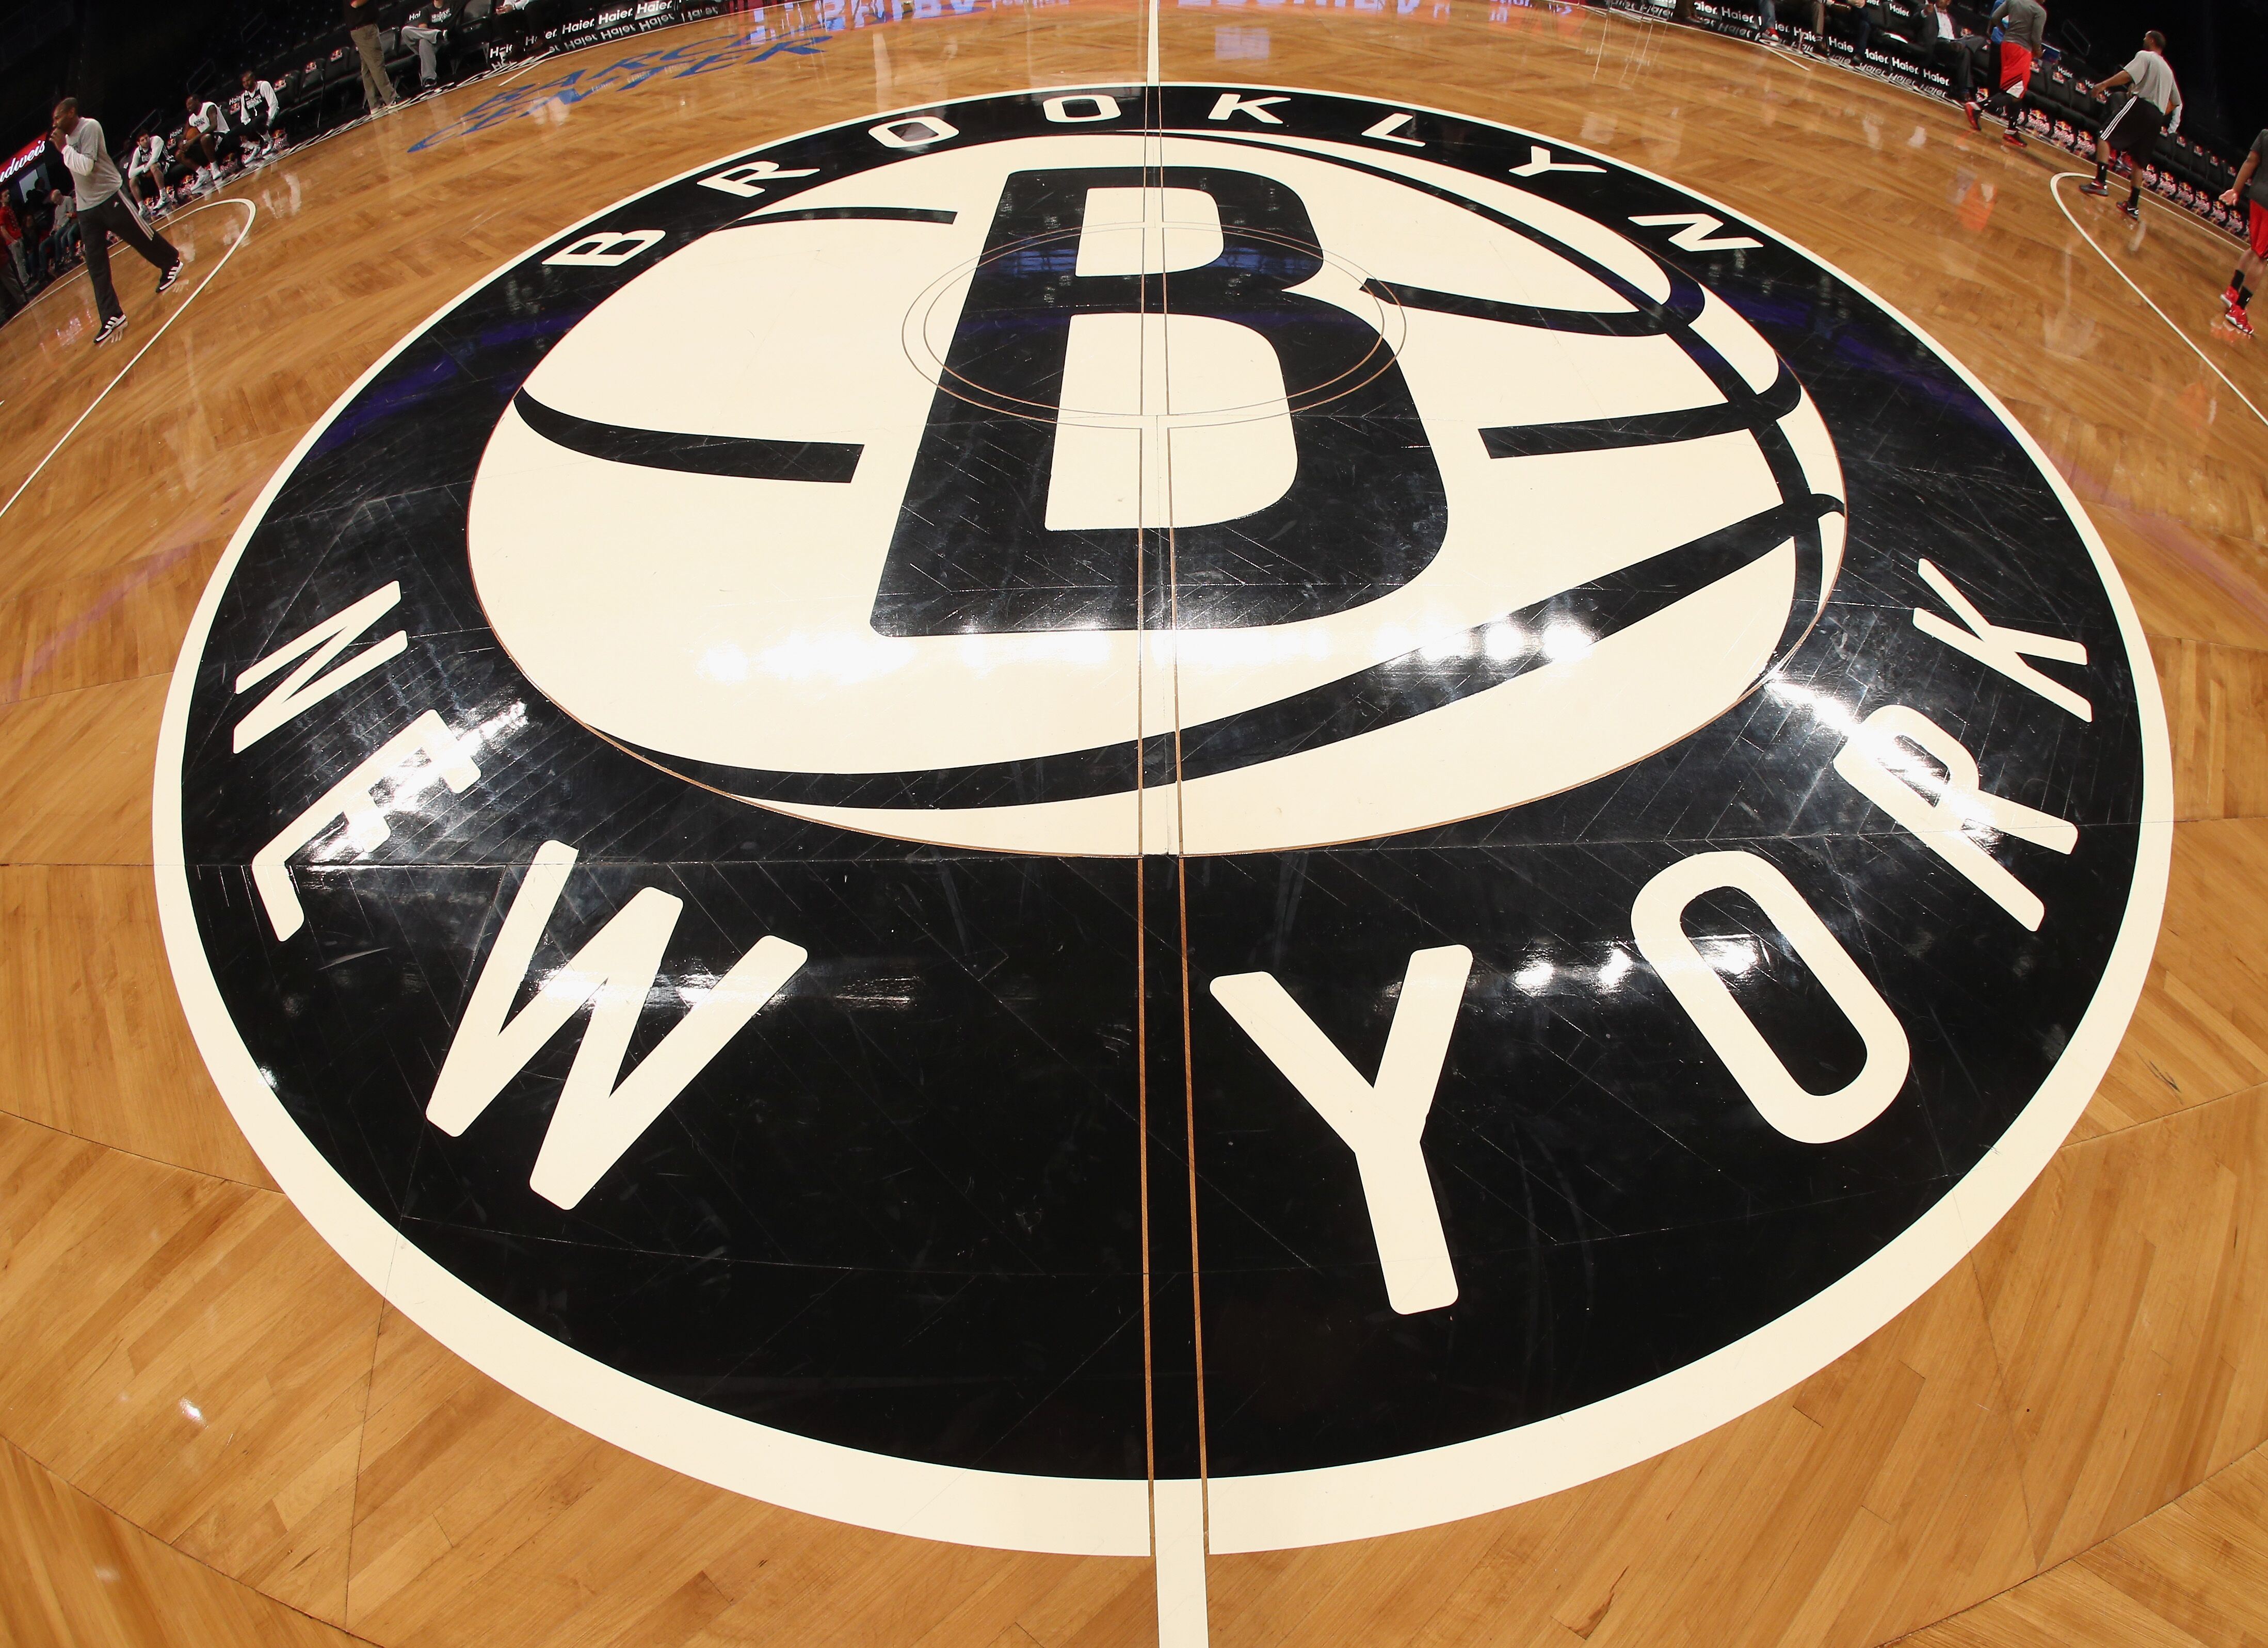 1217a53e8d6 Brooklyn Nets  Honoring legacy of Drazen Petrovic makes sense